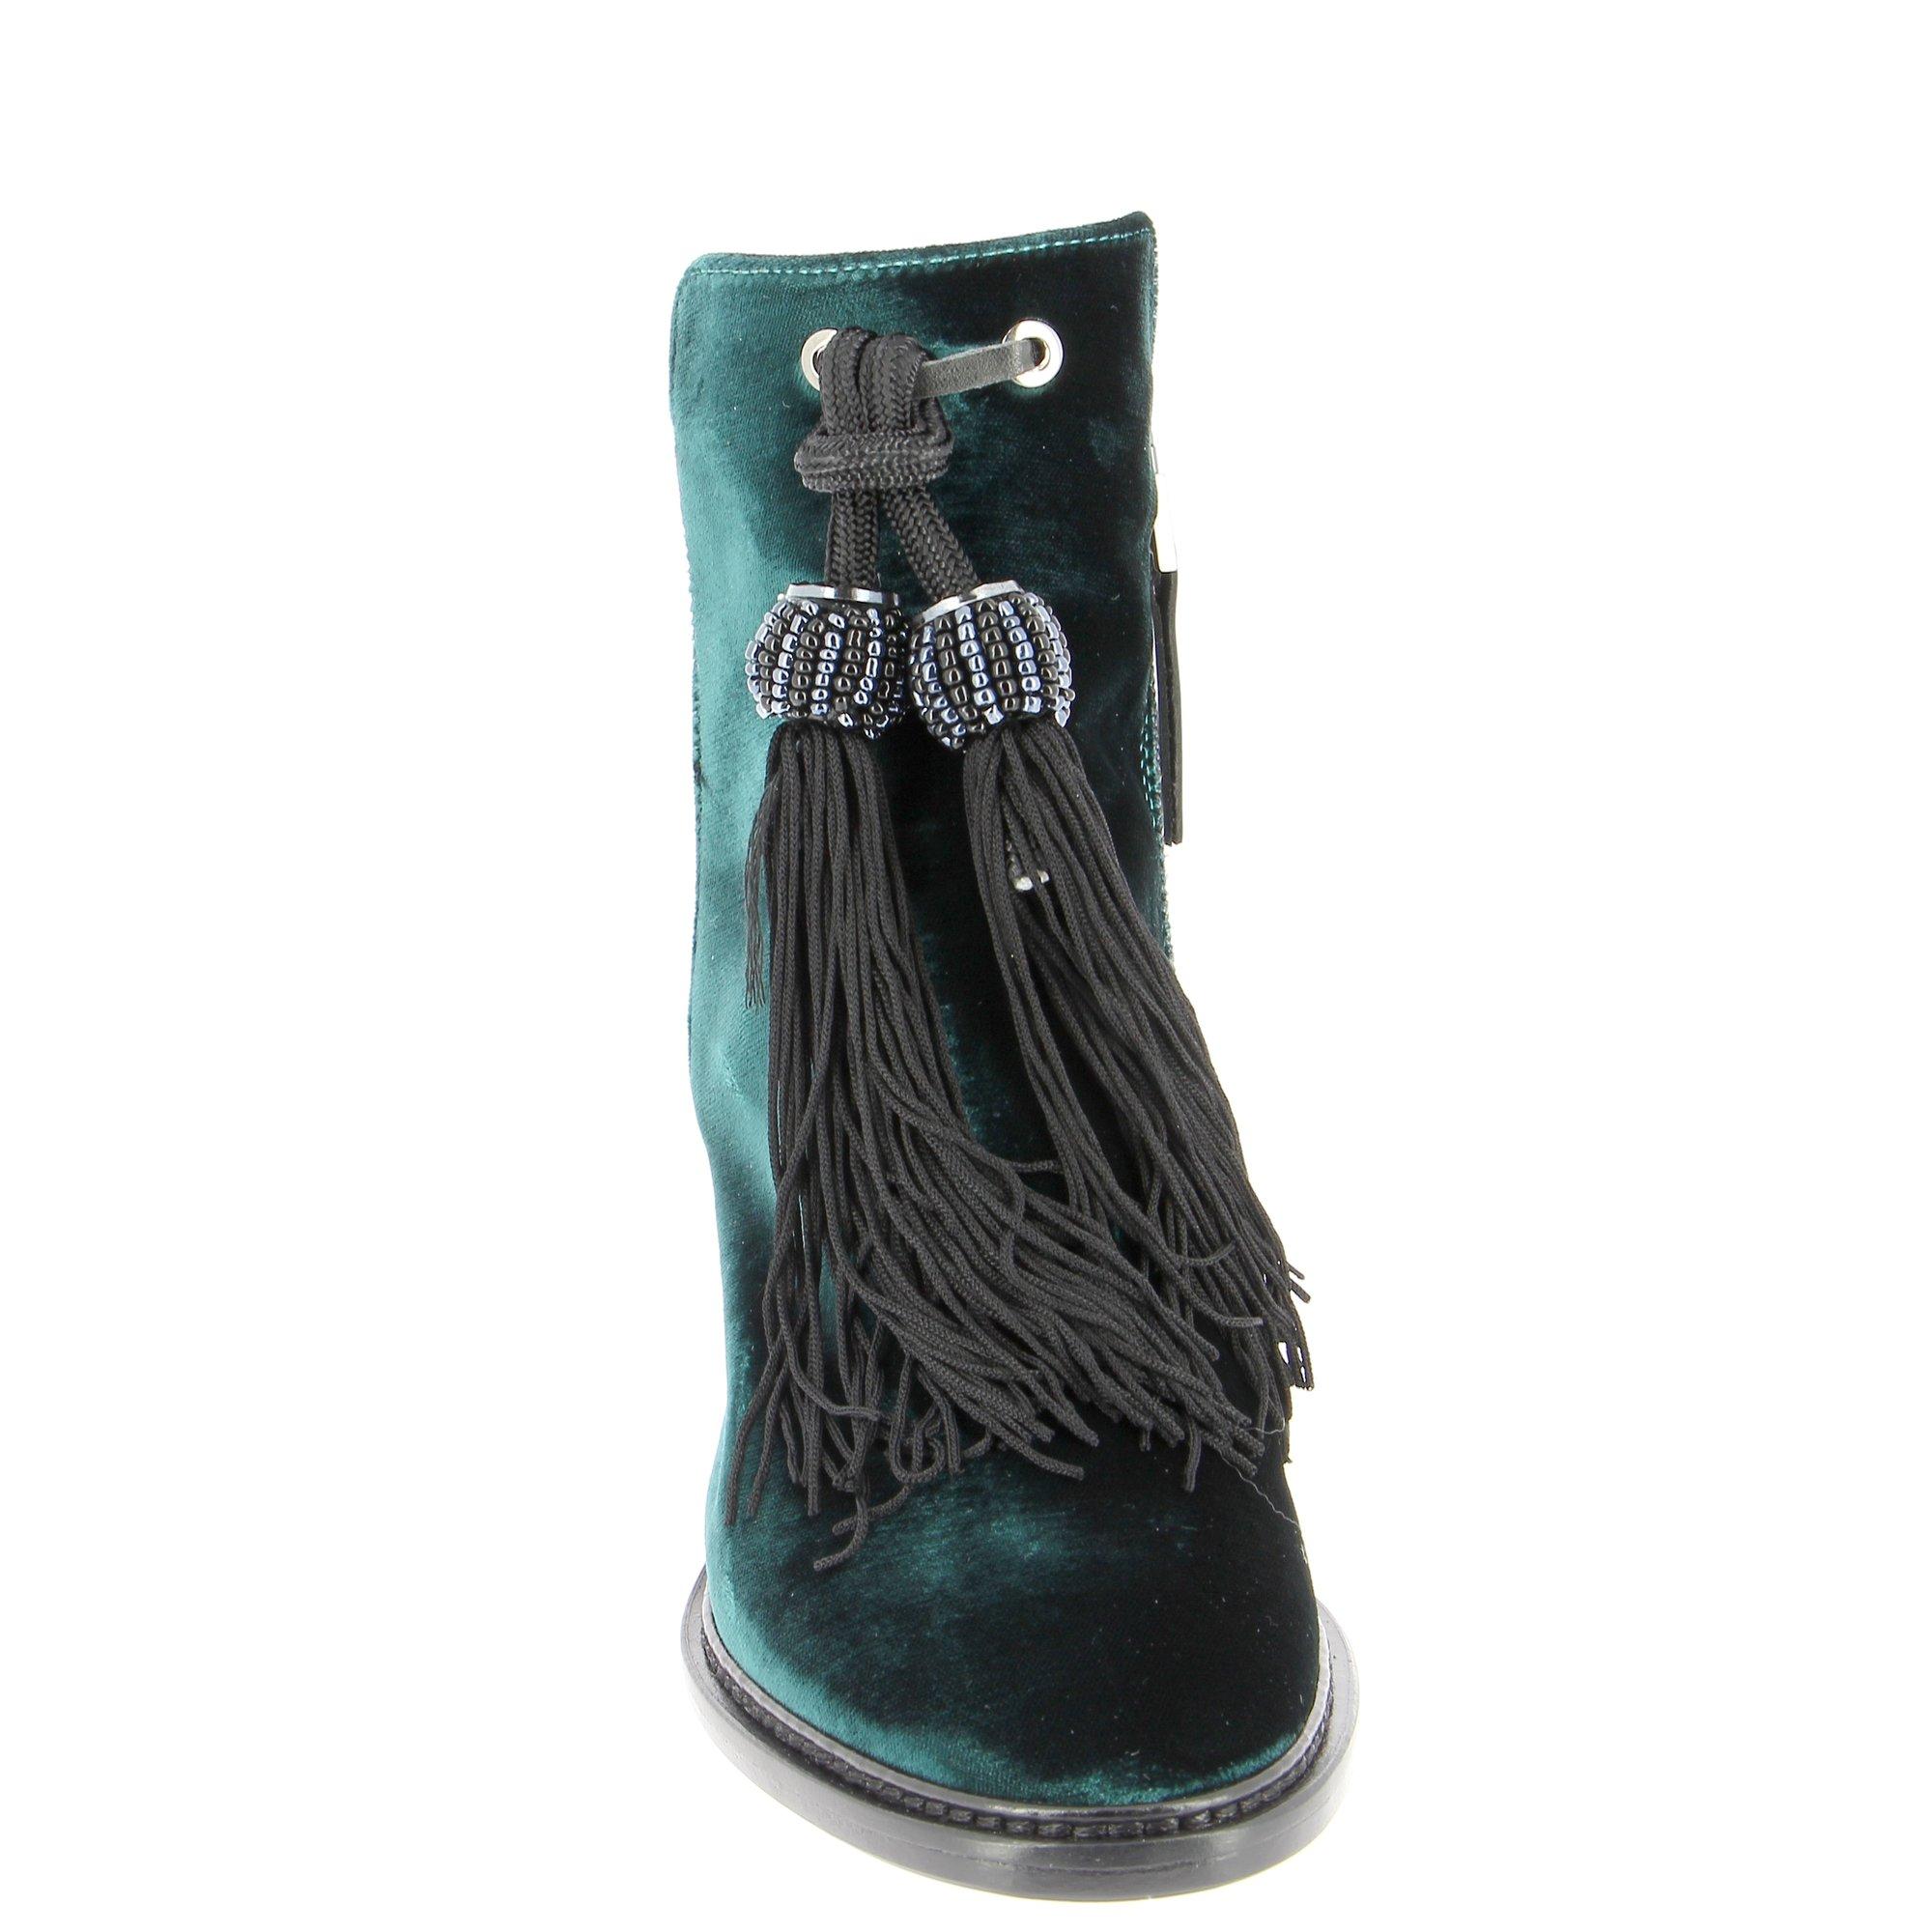 Dga Boots groen